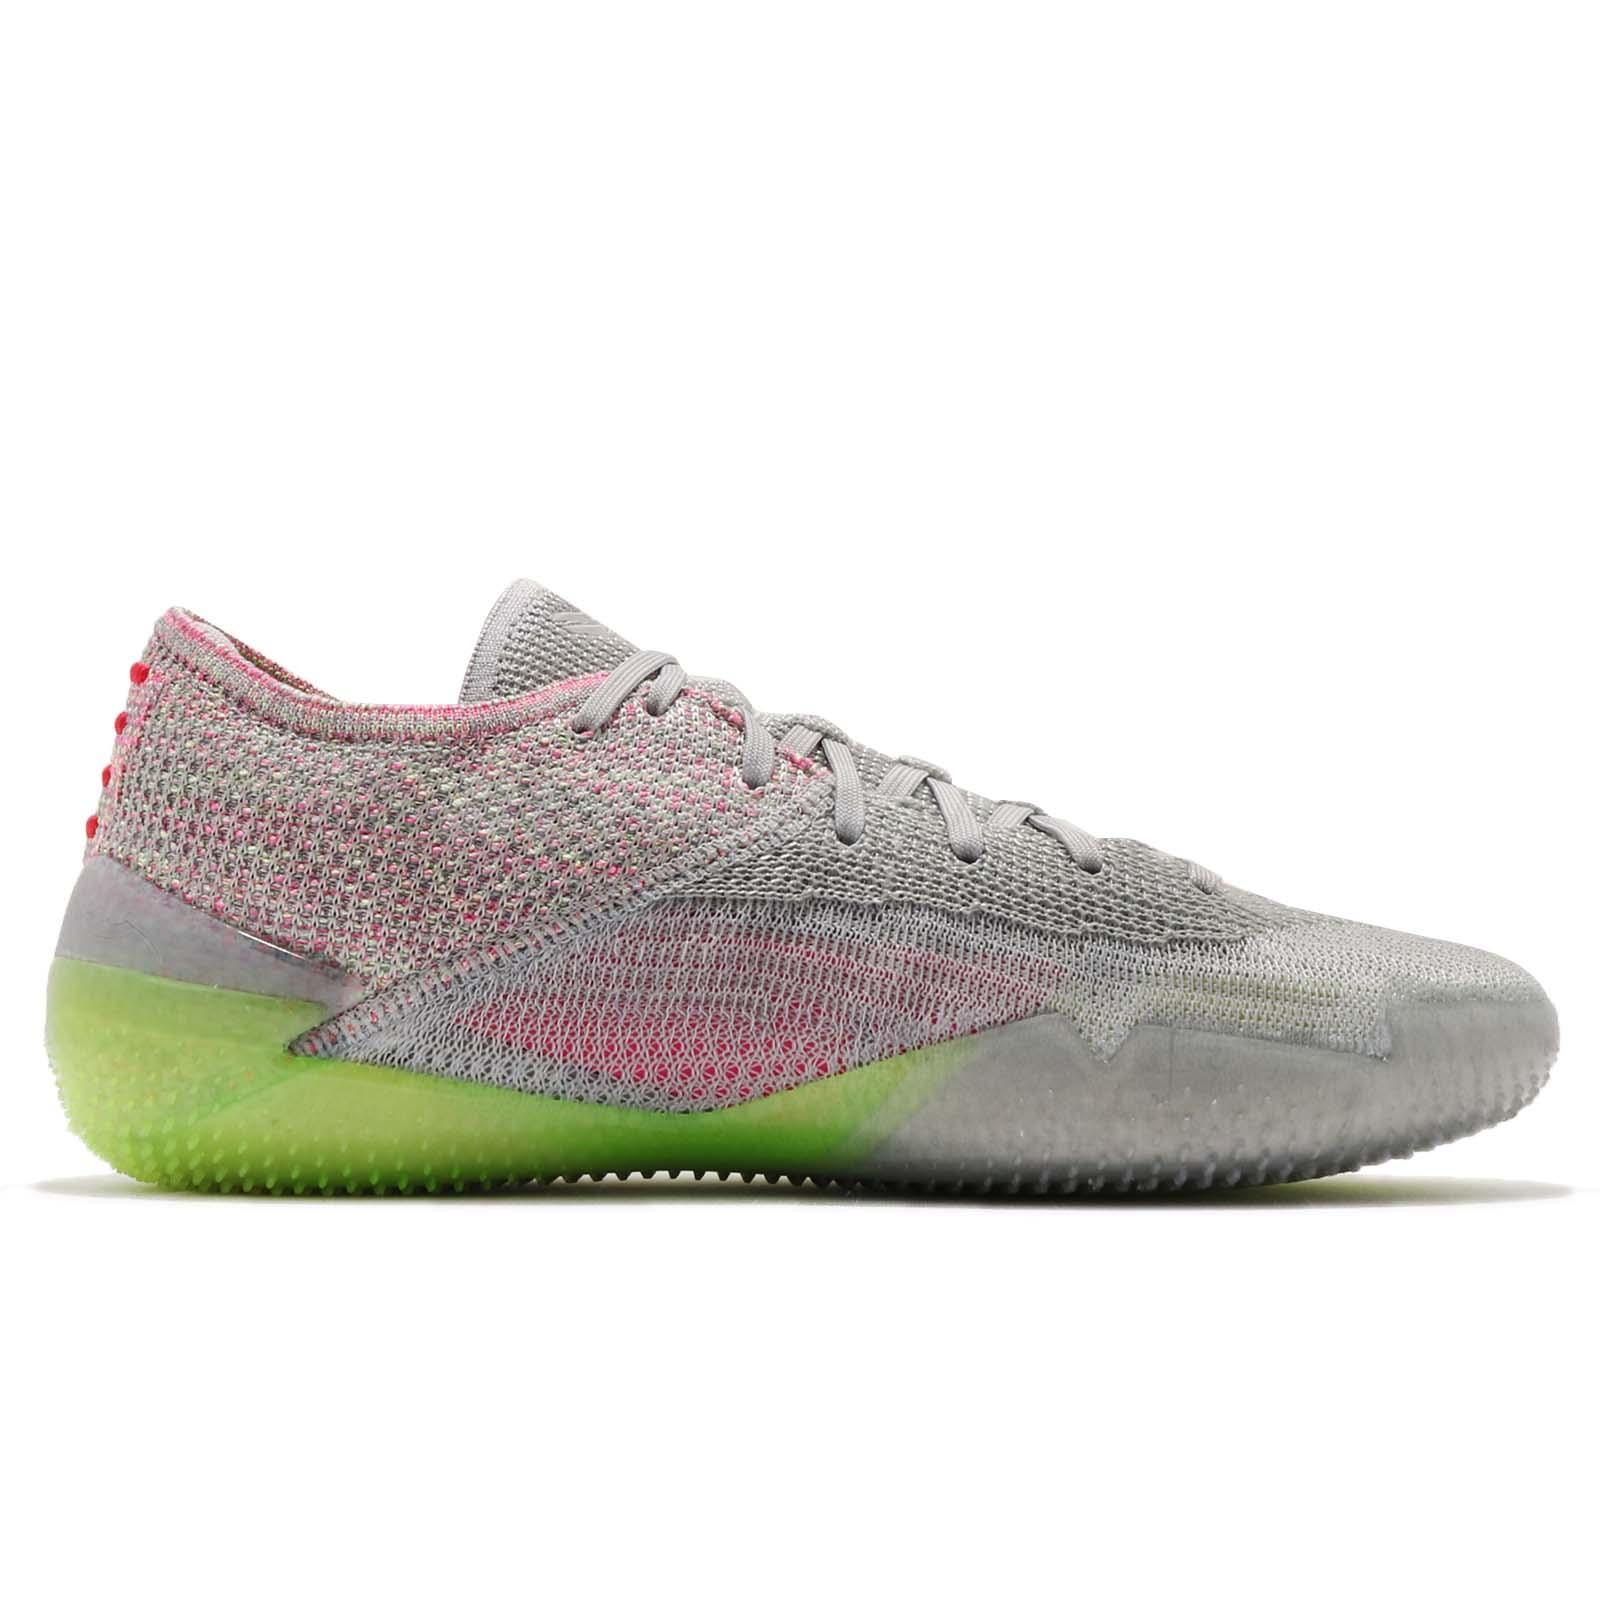 8a53d4e8a44 Nike Kobe AD NXT 360 Grey Multi-Color Bryant Men Basketball Shoes ...